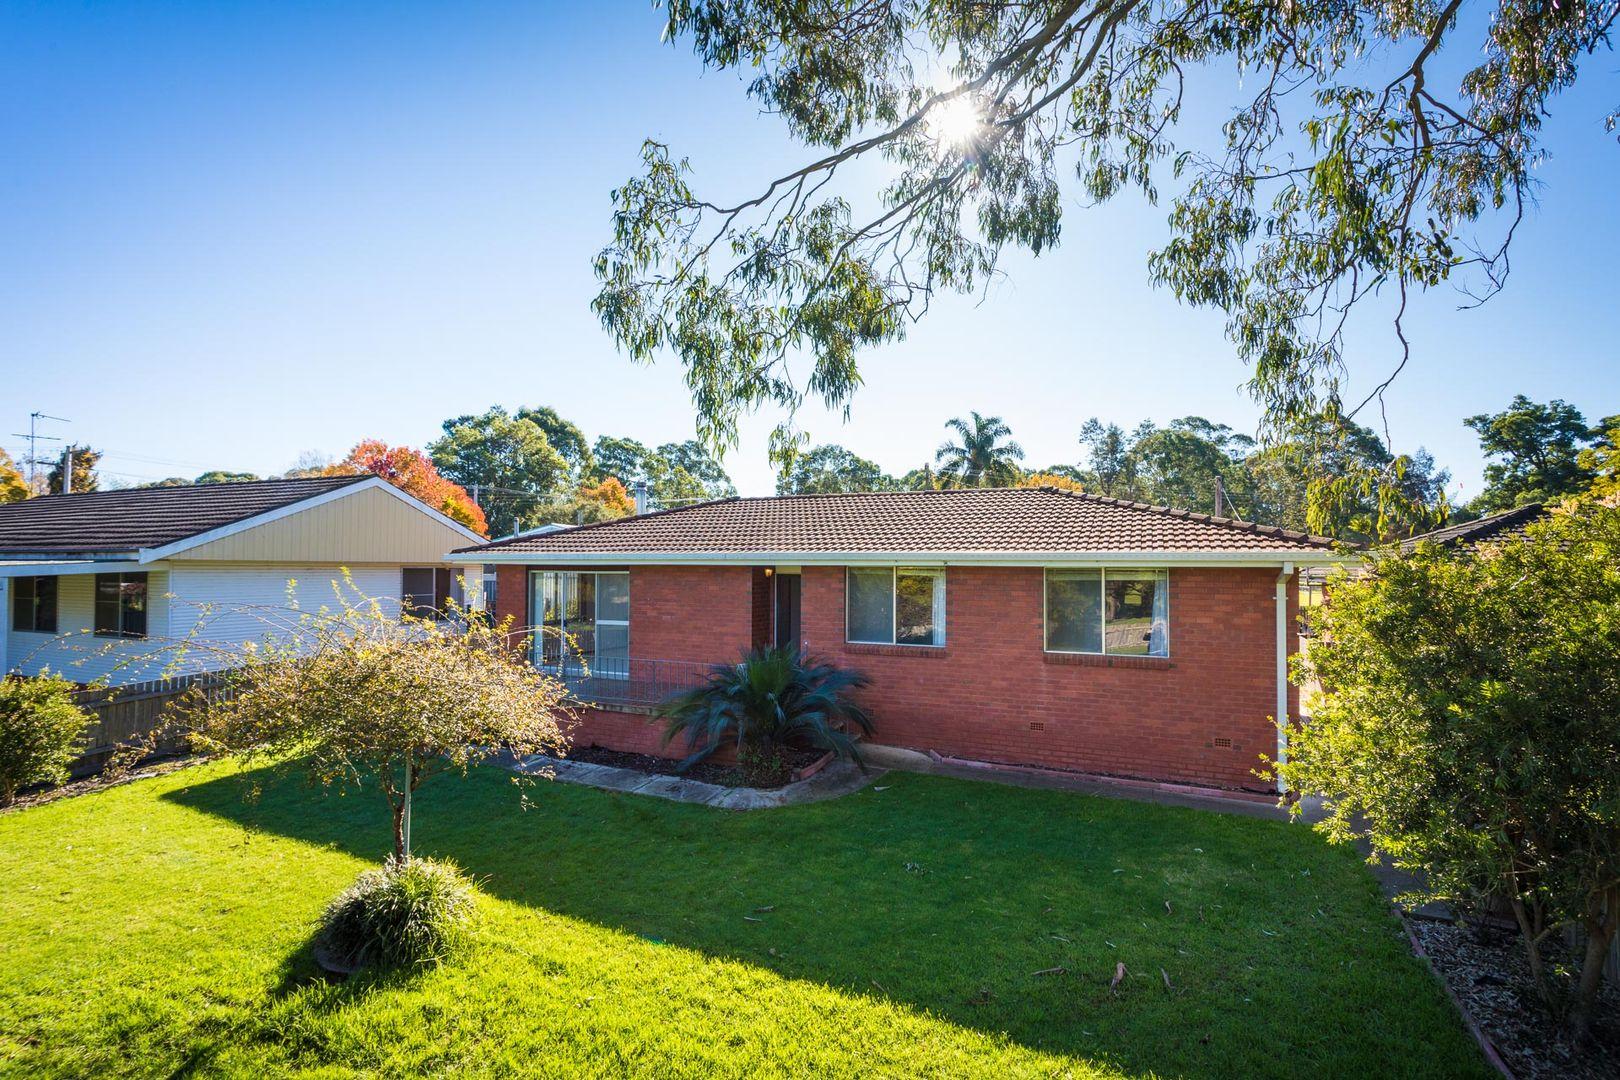 1450 Tarraganda Lane, Tarraganda NSW 2550, Image 1